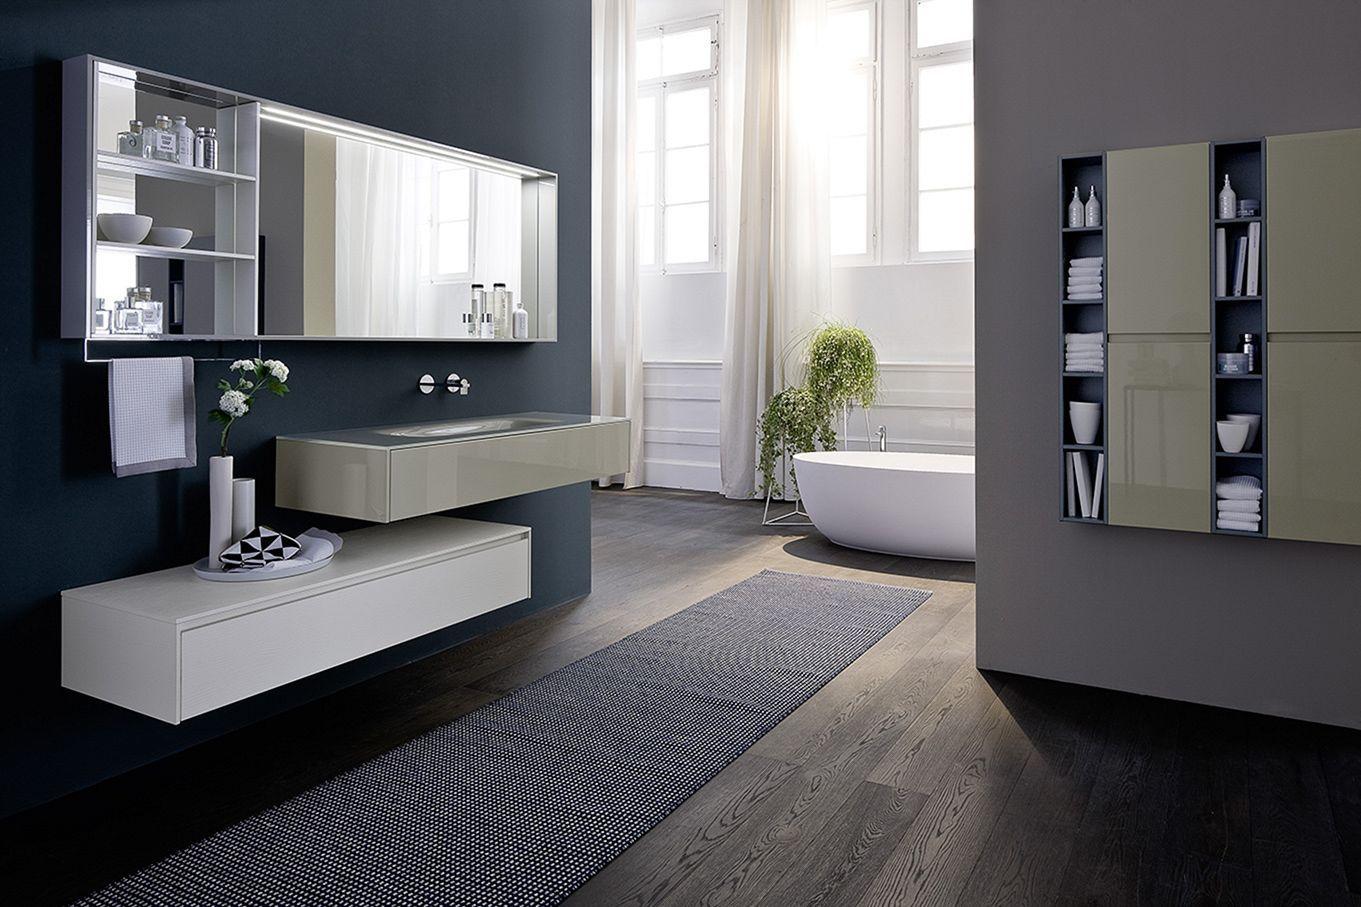 20 Incredible Bathroom Furniture Design Ideas For Those Who Love Beauty Bathroom Furniture Design Bathroom Furniture Modern Bathroom And Walk In Closet Bathroom furniture design ideas